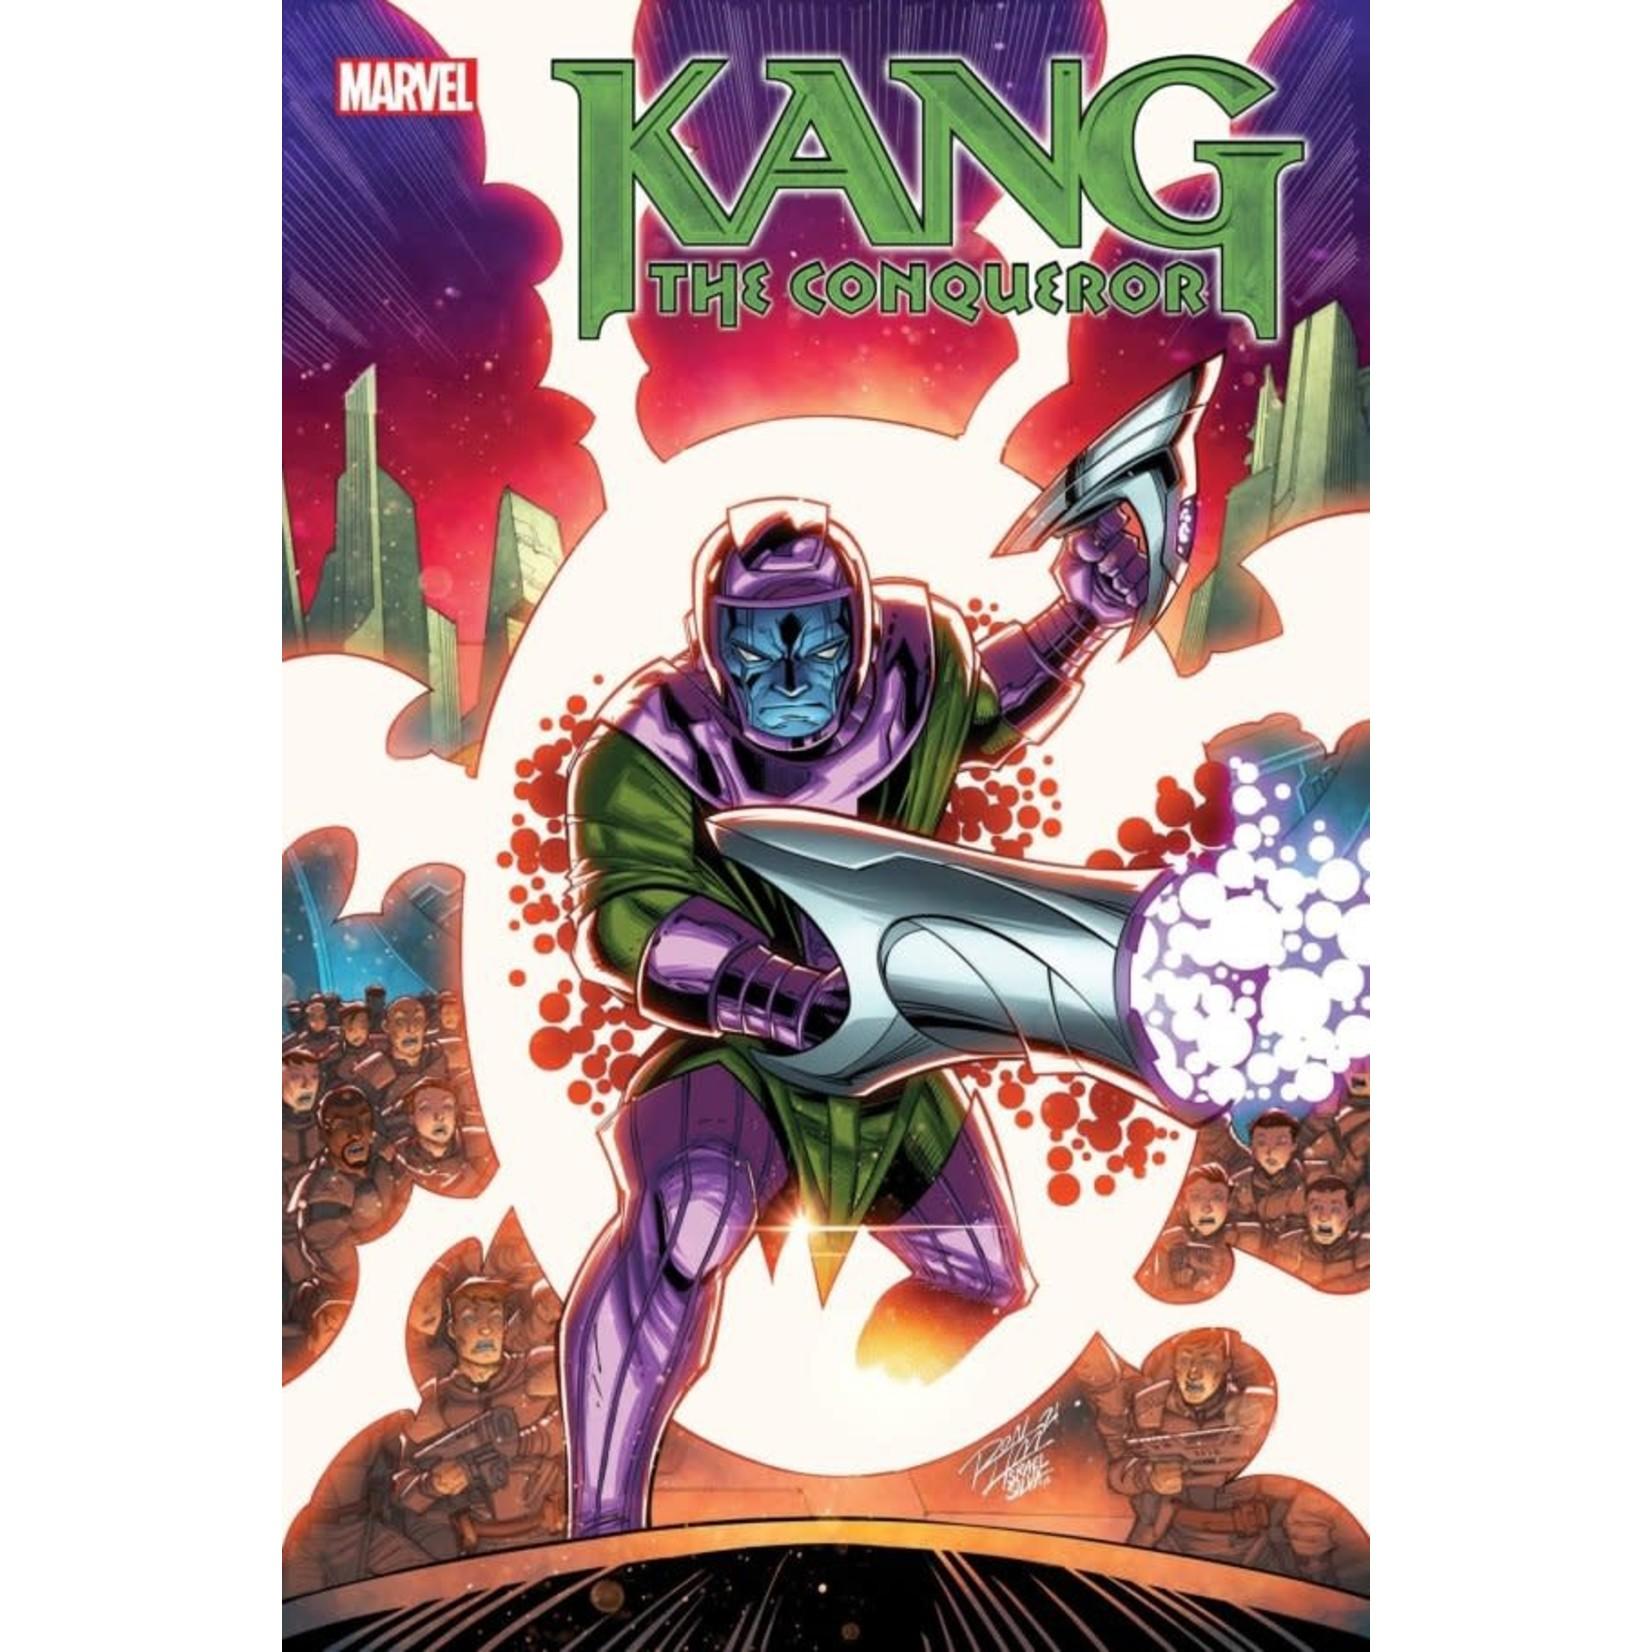 Kang the Conqueror #3 Ron Lim Variant